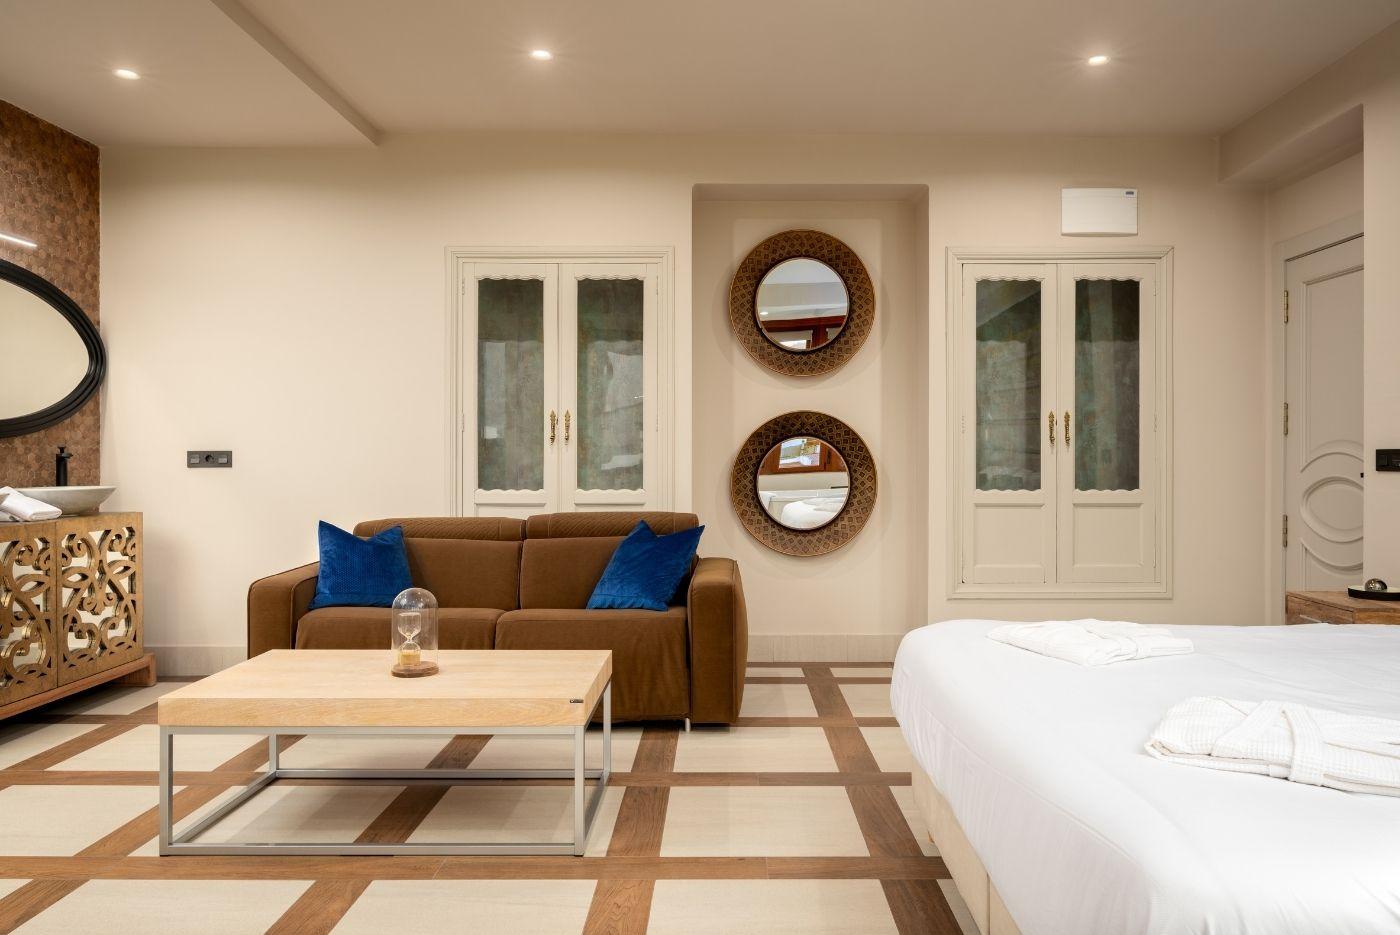 Apartamento-Suite-Deluxe-64-Oviedo-1907-03